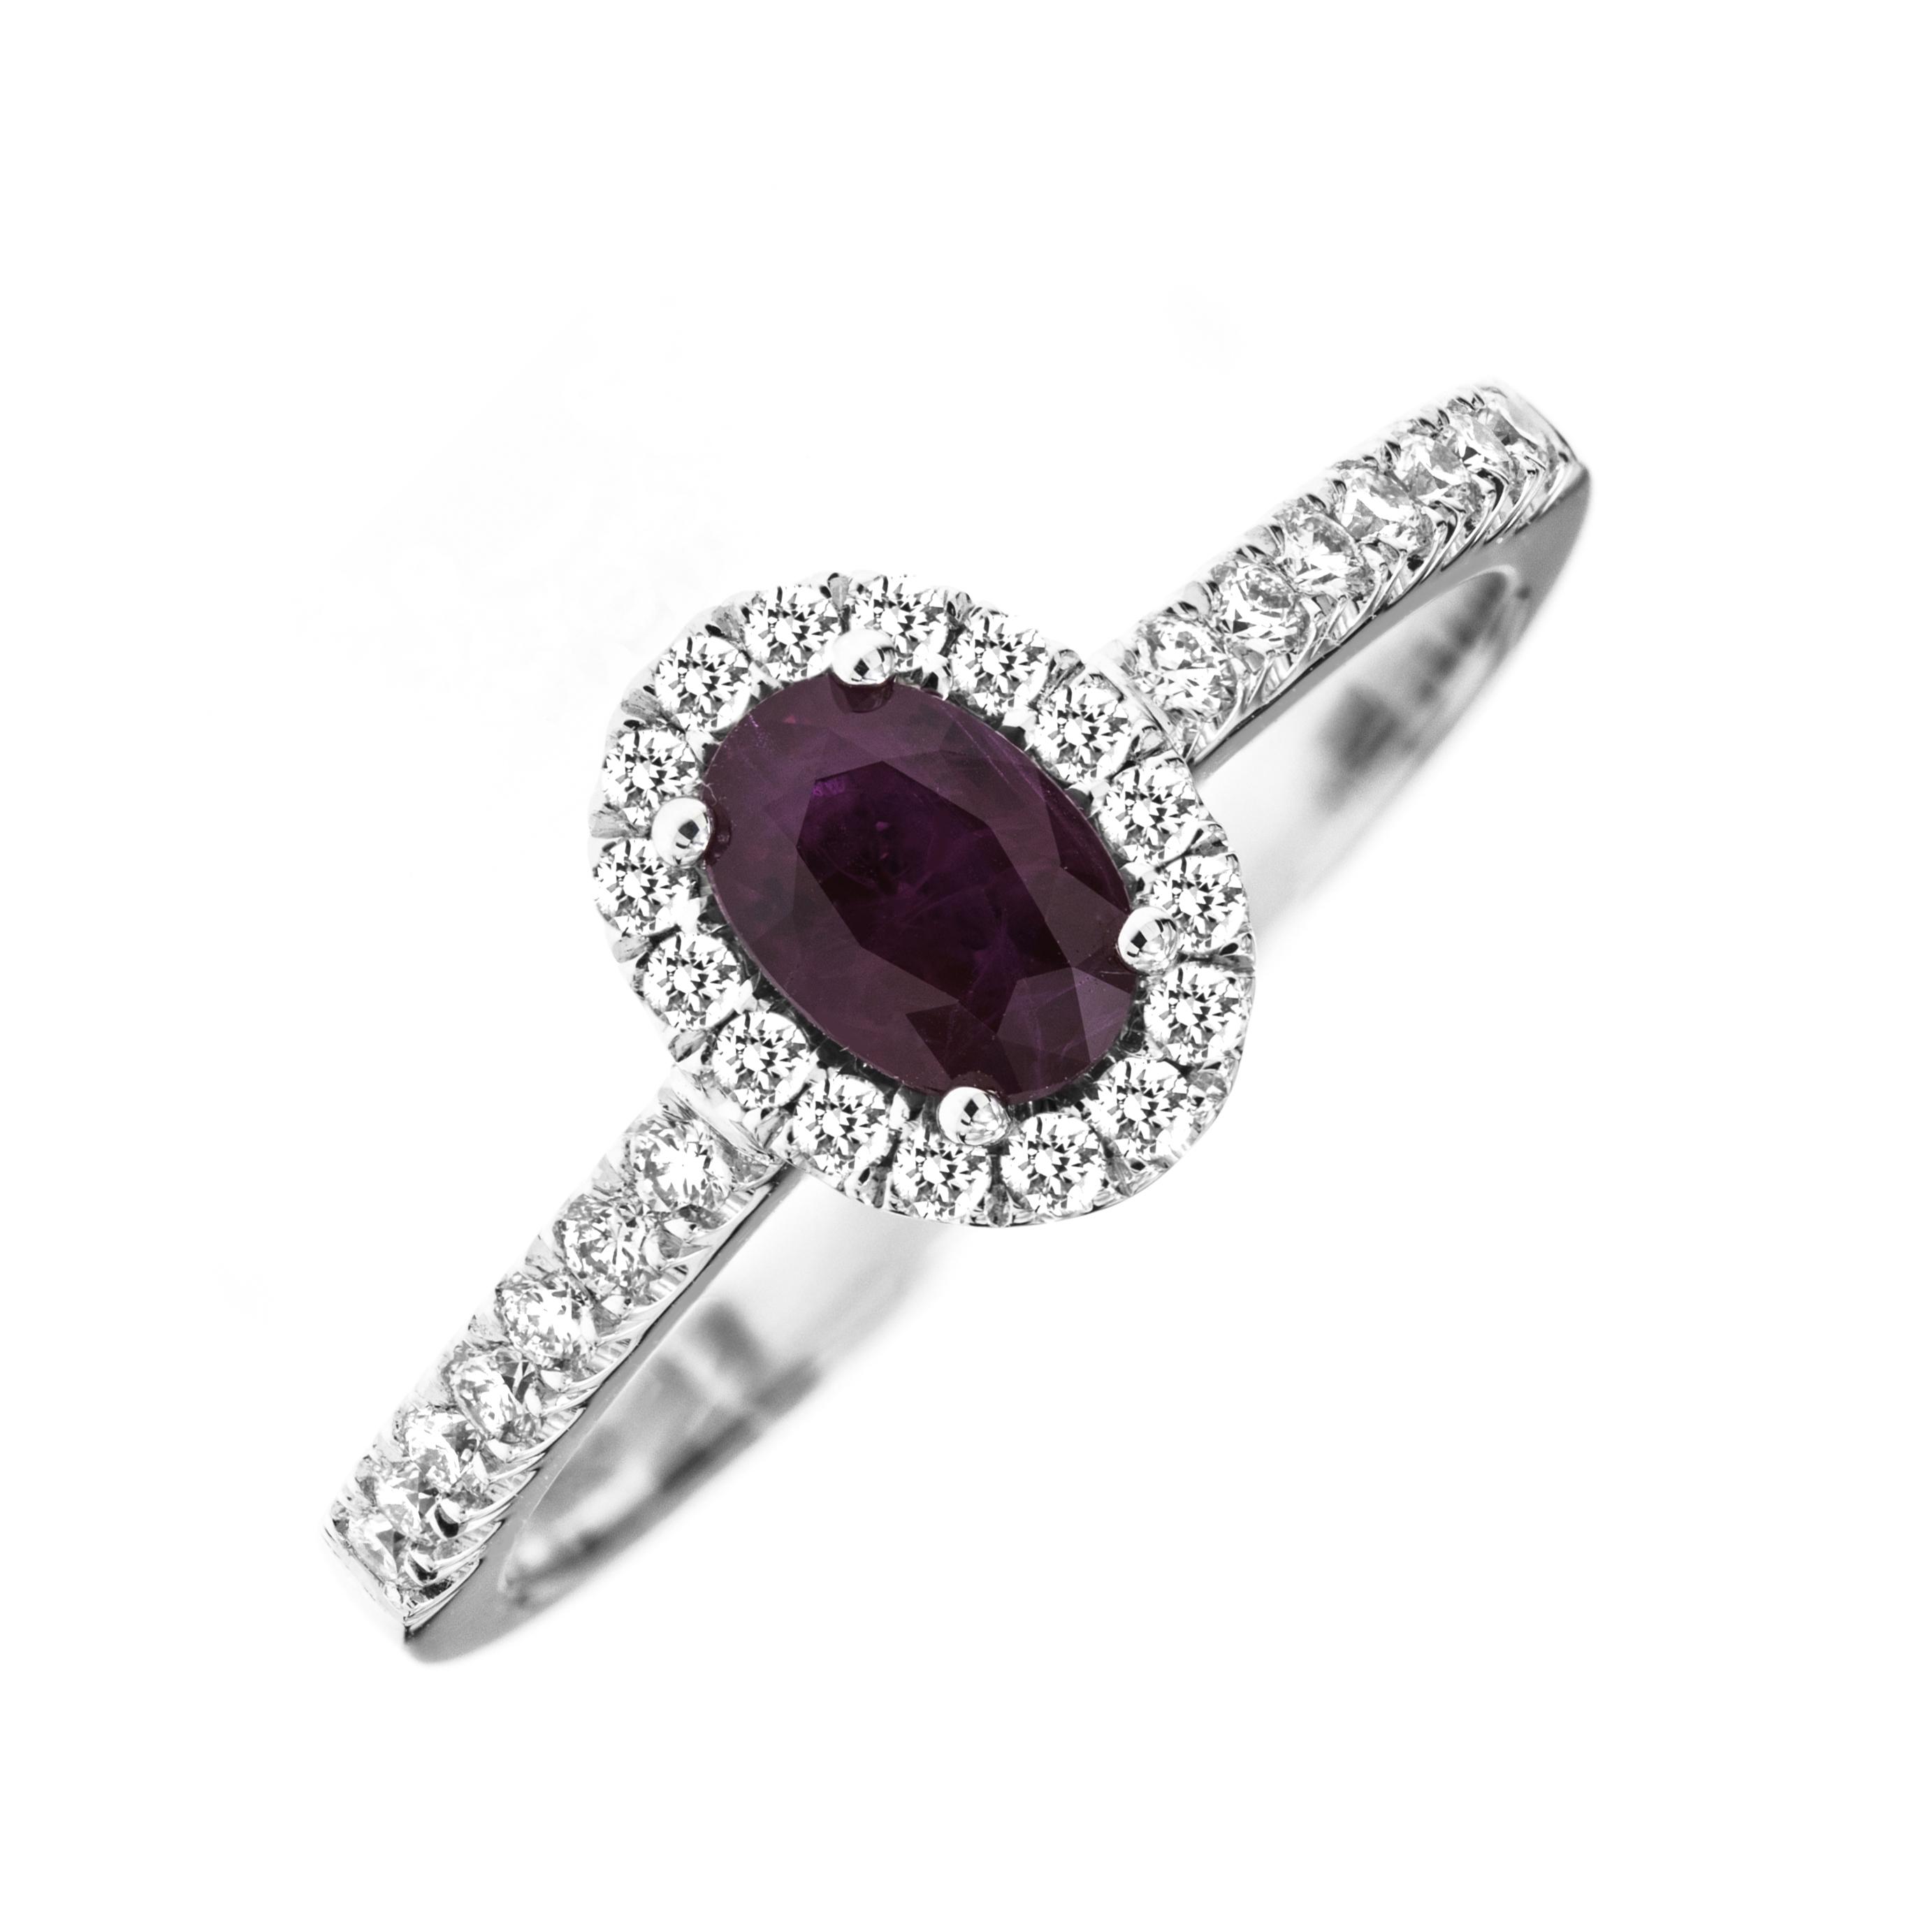 Inel Rubin si Diamante Dama Aur Alb 18kt cu un Rubin Oval si Diamante Rotunde-img1